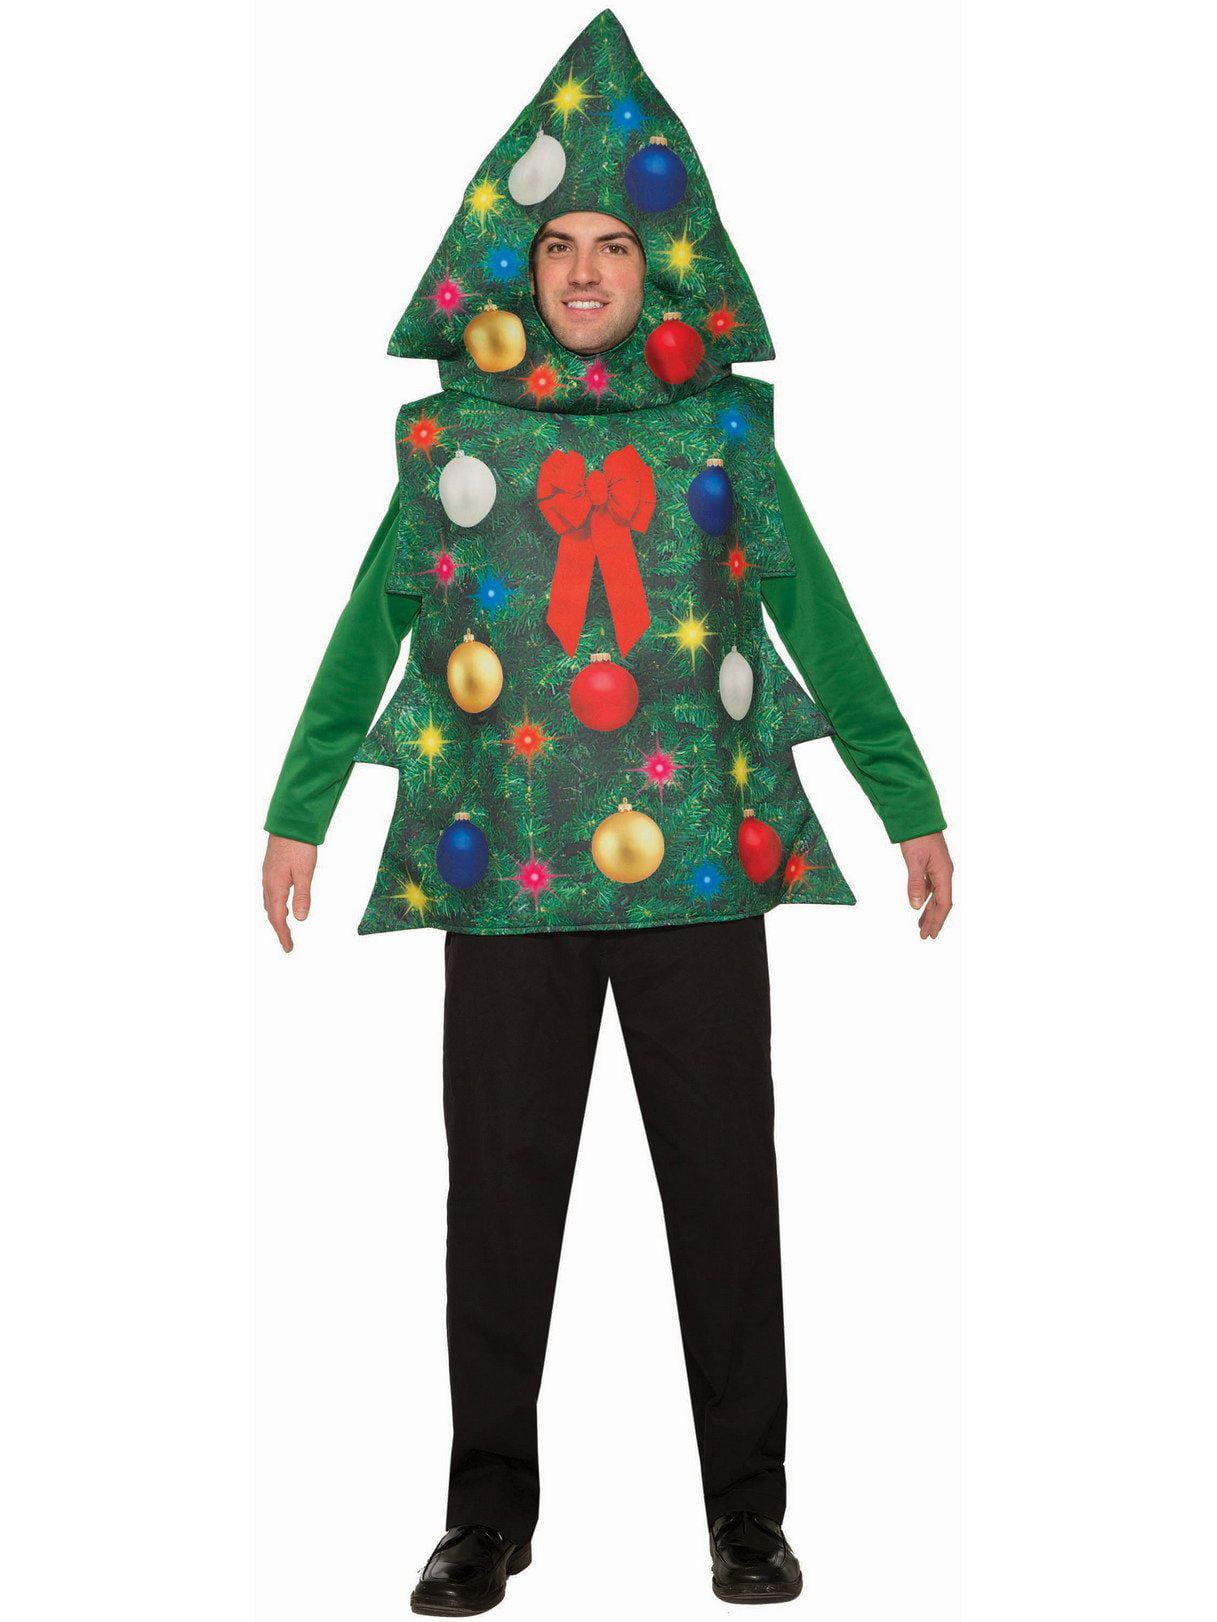 Adult Christmas Tree Costume - Walmart.com - Walmart.com